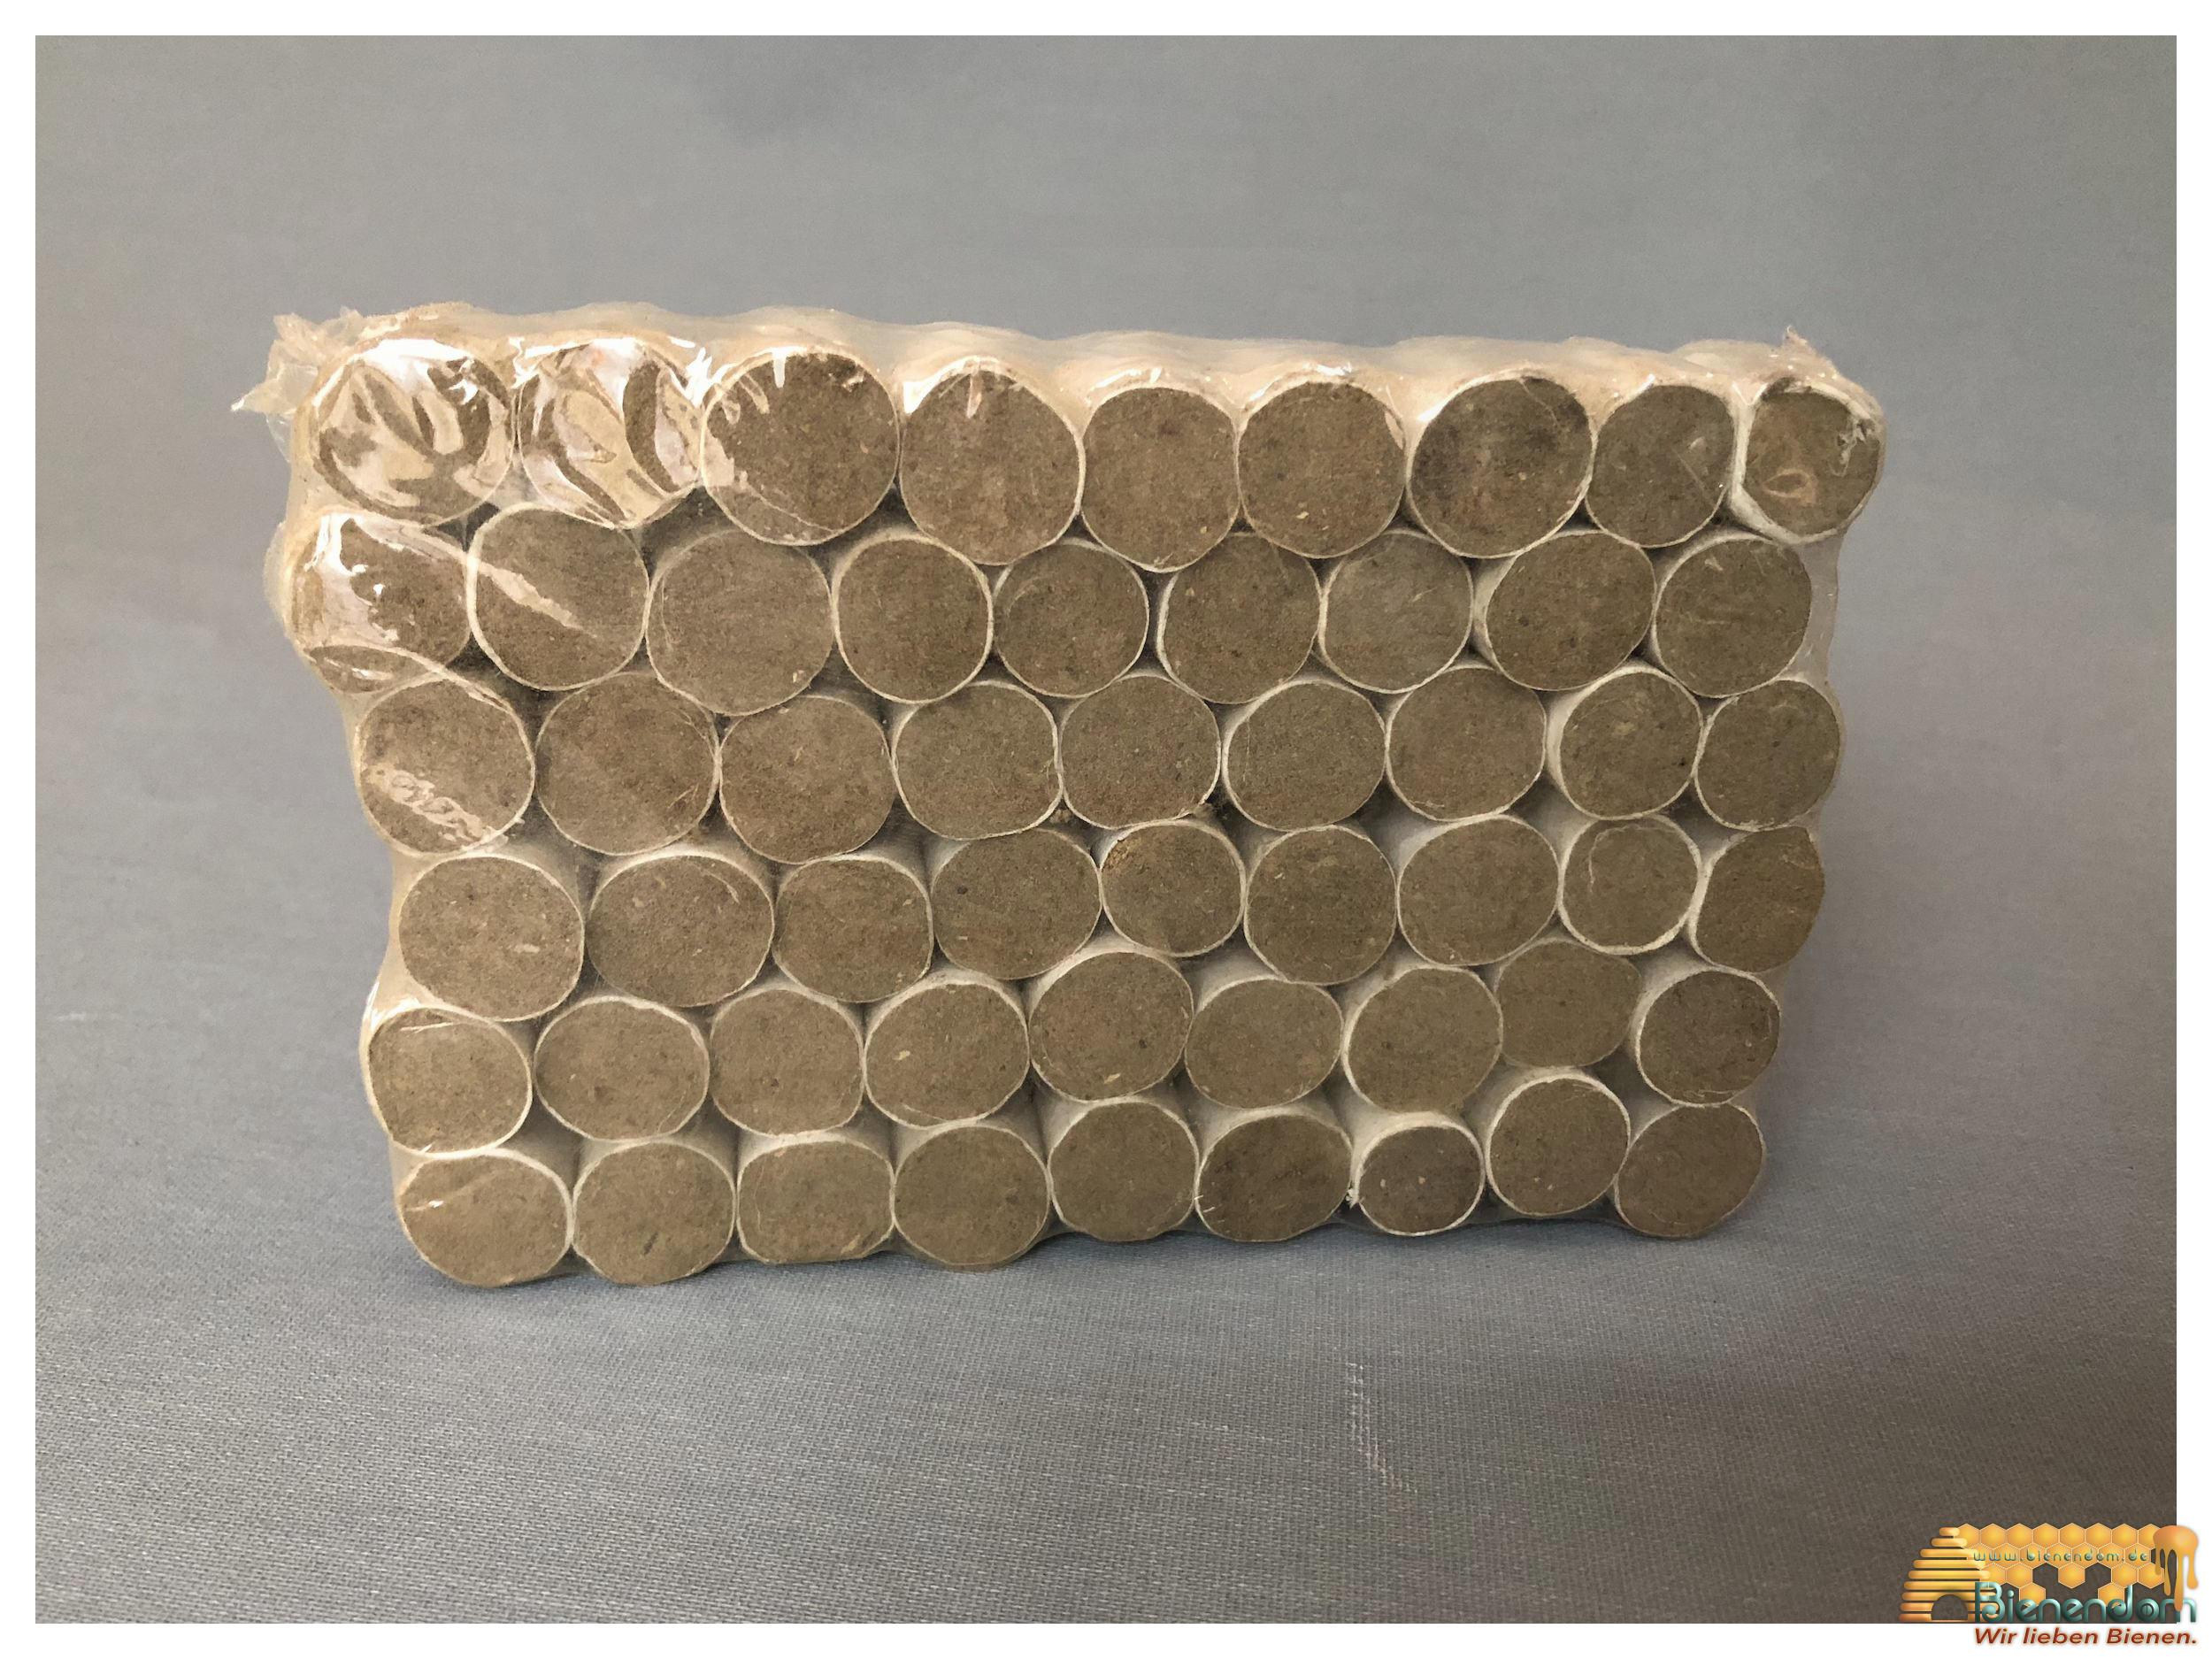 Imker Tabak Räucherpatronen Set